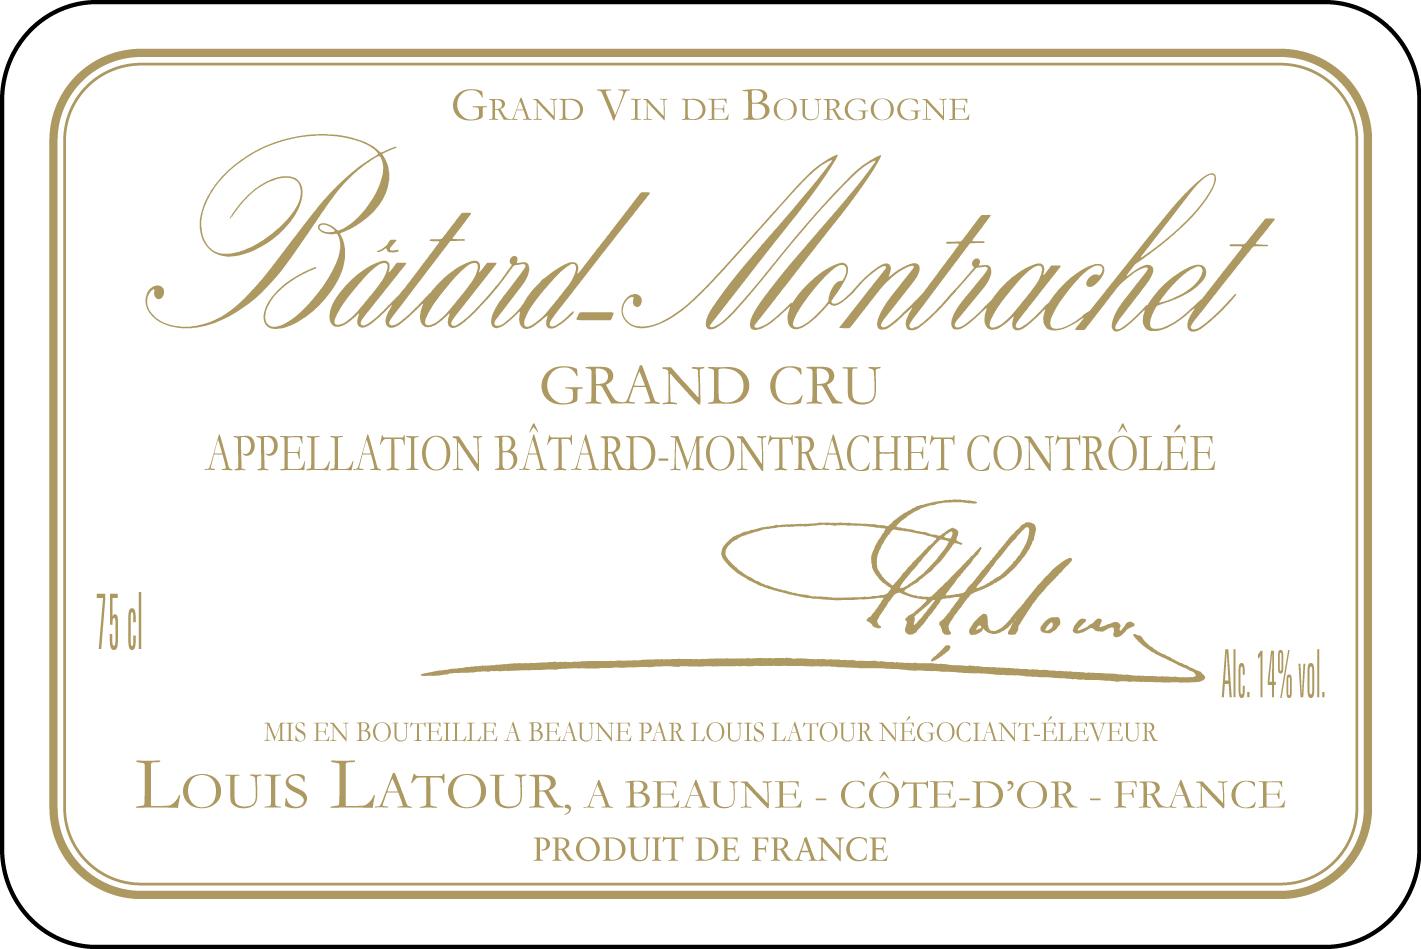 Fabuleux Bâtard-Montrachet Grand Cru - Maison Louis Latour KJ25